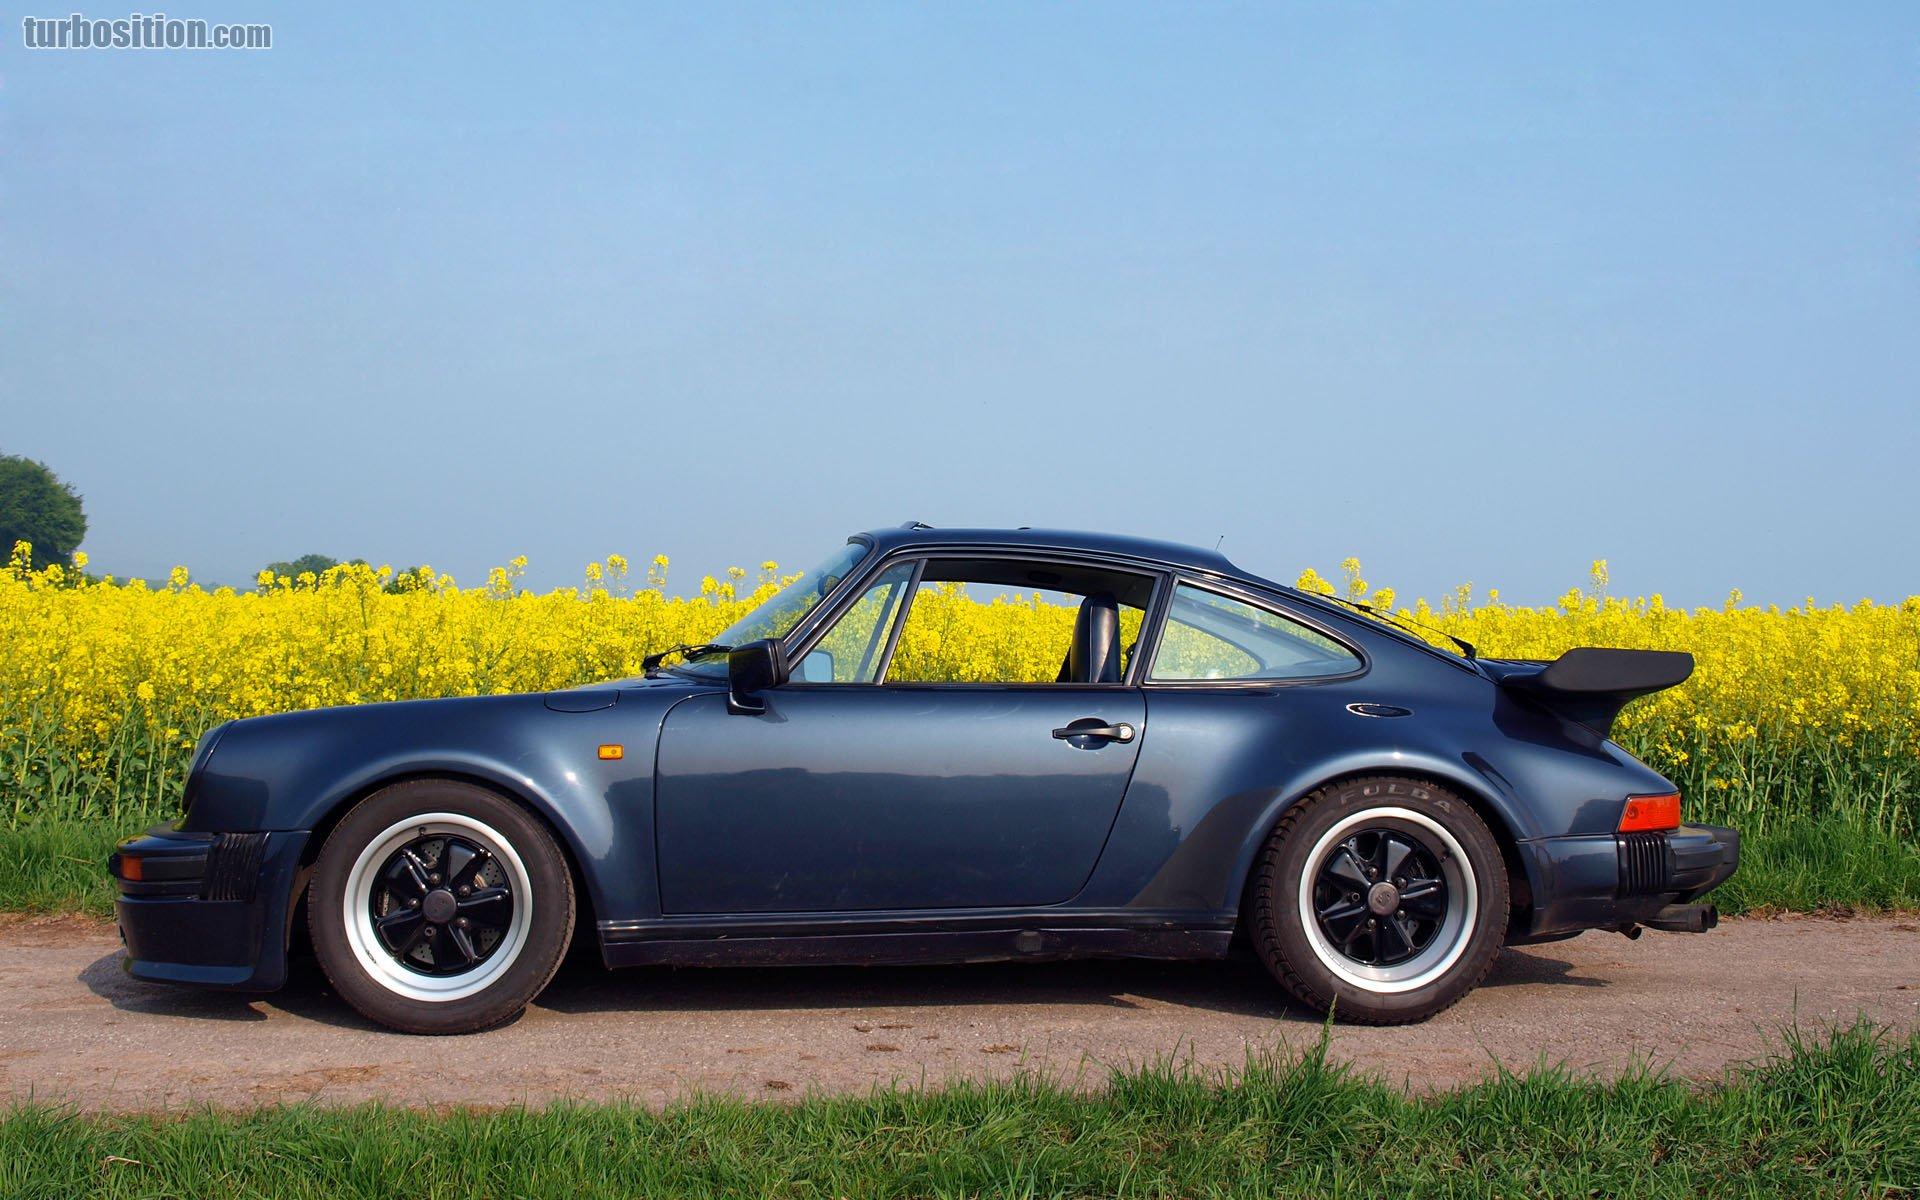 Porsche 930 For Sale >> Porsche 930 prussian-blue-metallic // Porsche of the month: 2015-06 // TurboSition